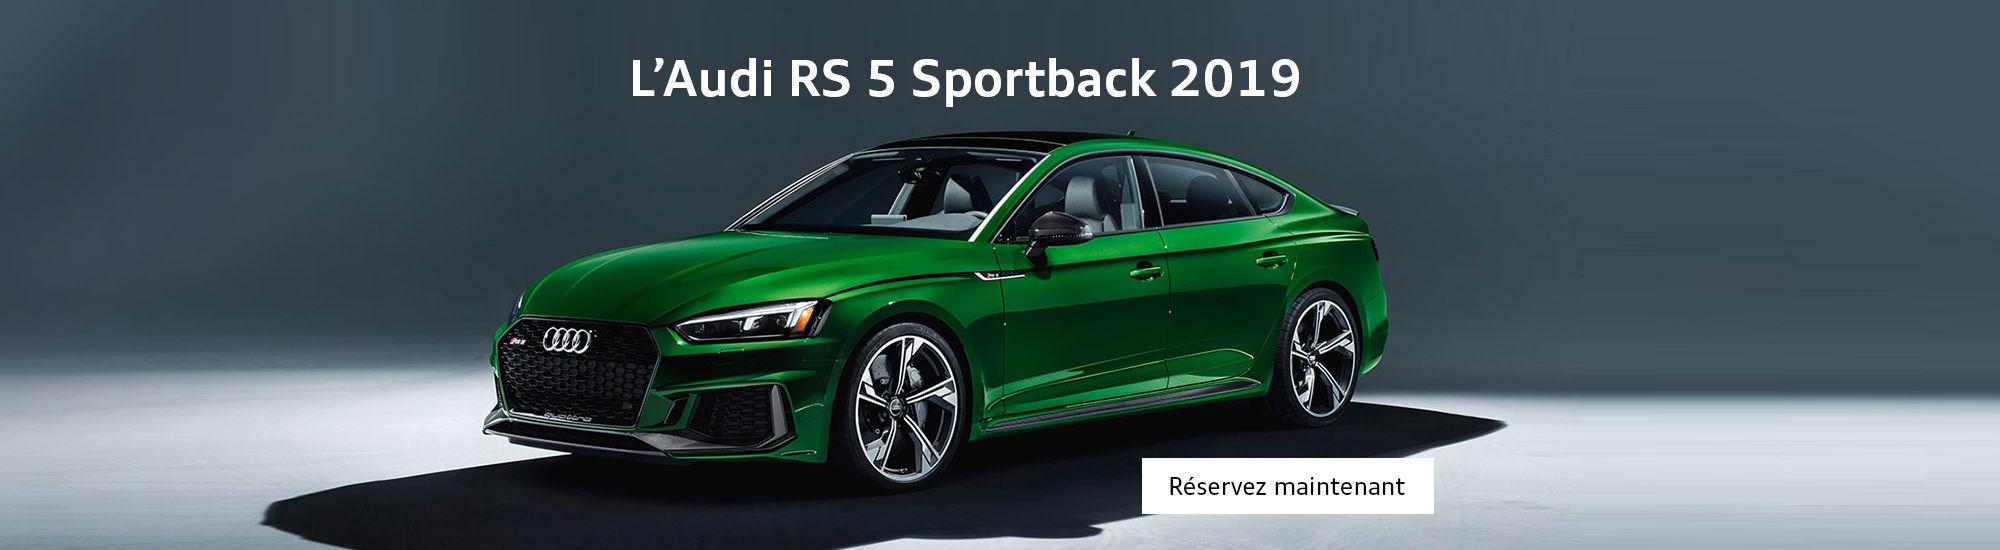 Audi RS 5 Sportback 2019